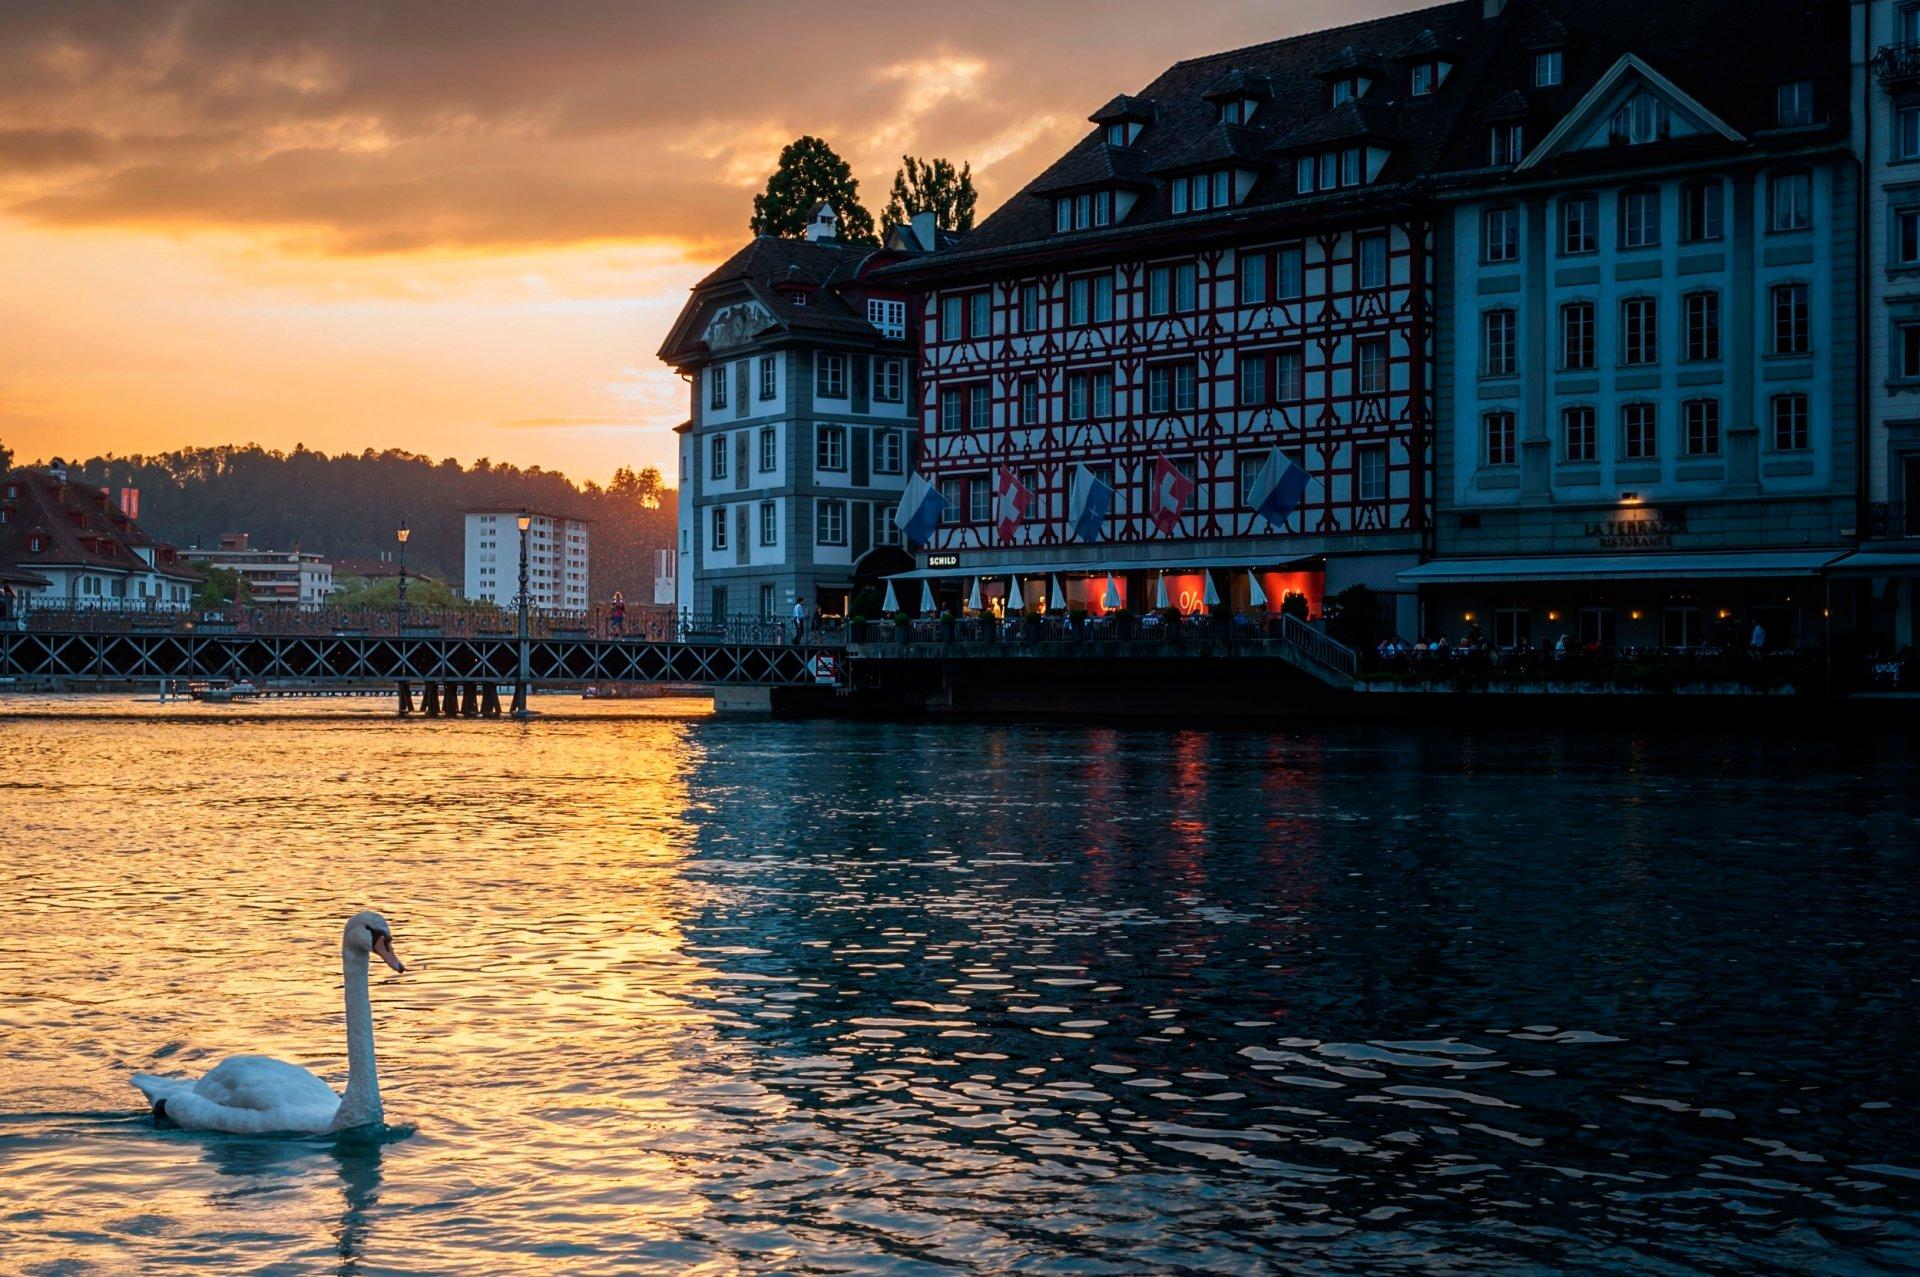 Обои люцерн, швейцария. Города foto 12